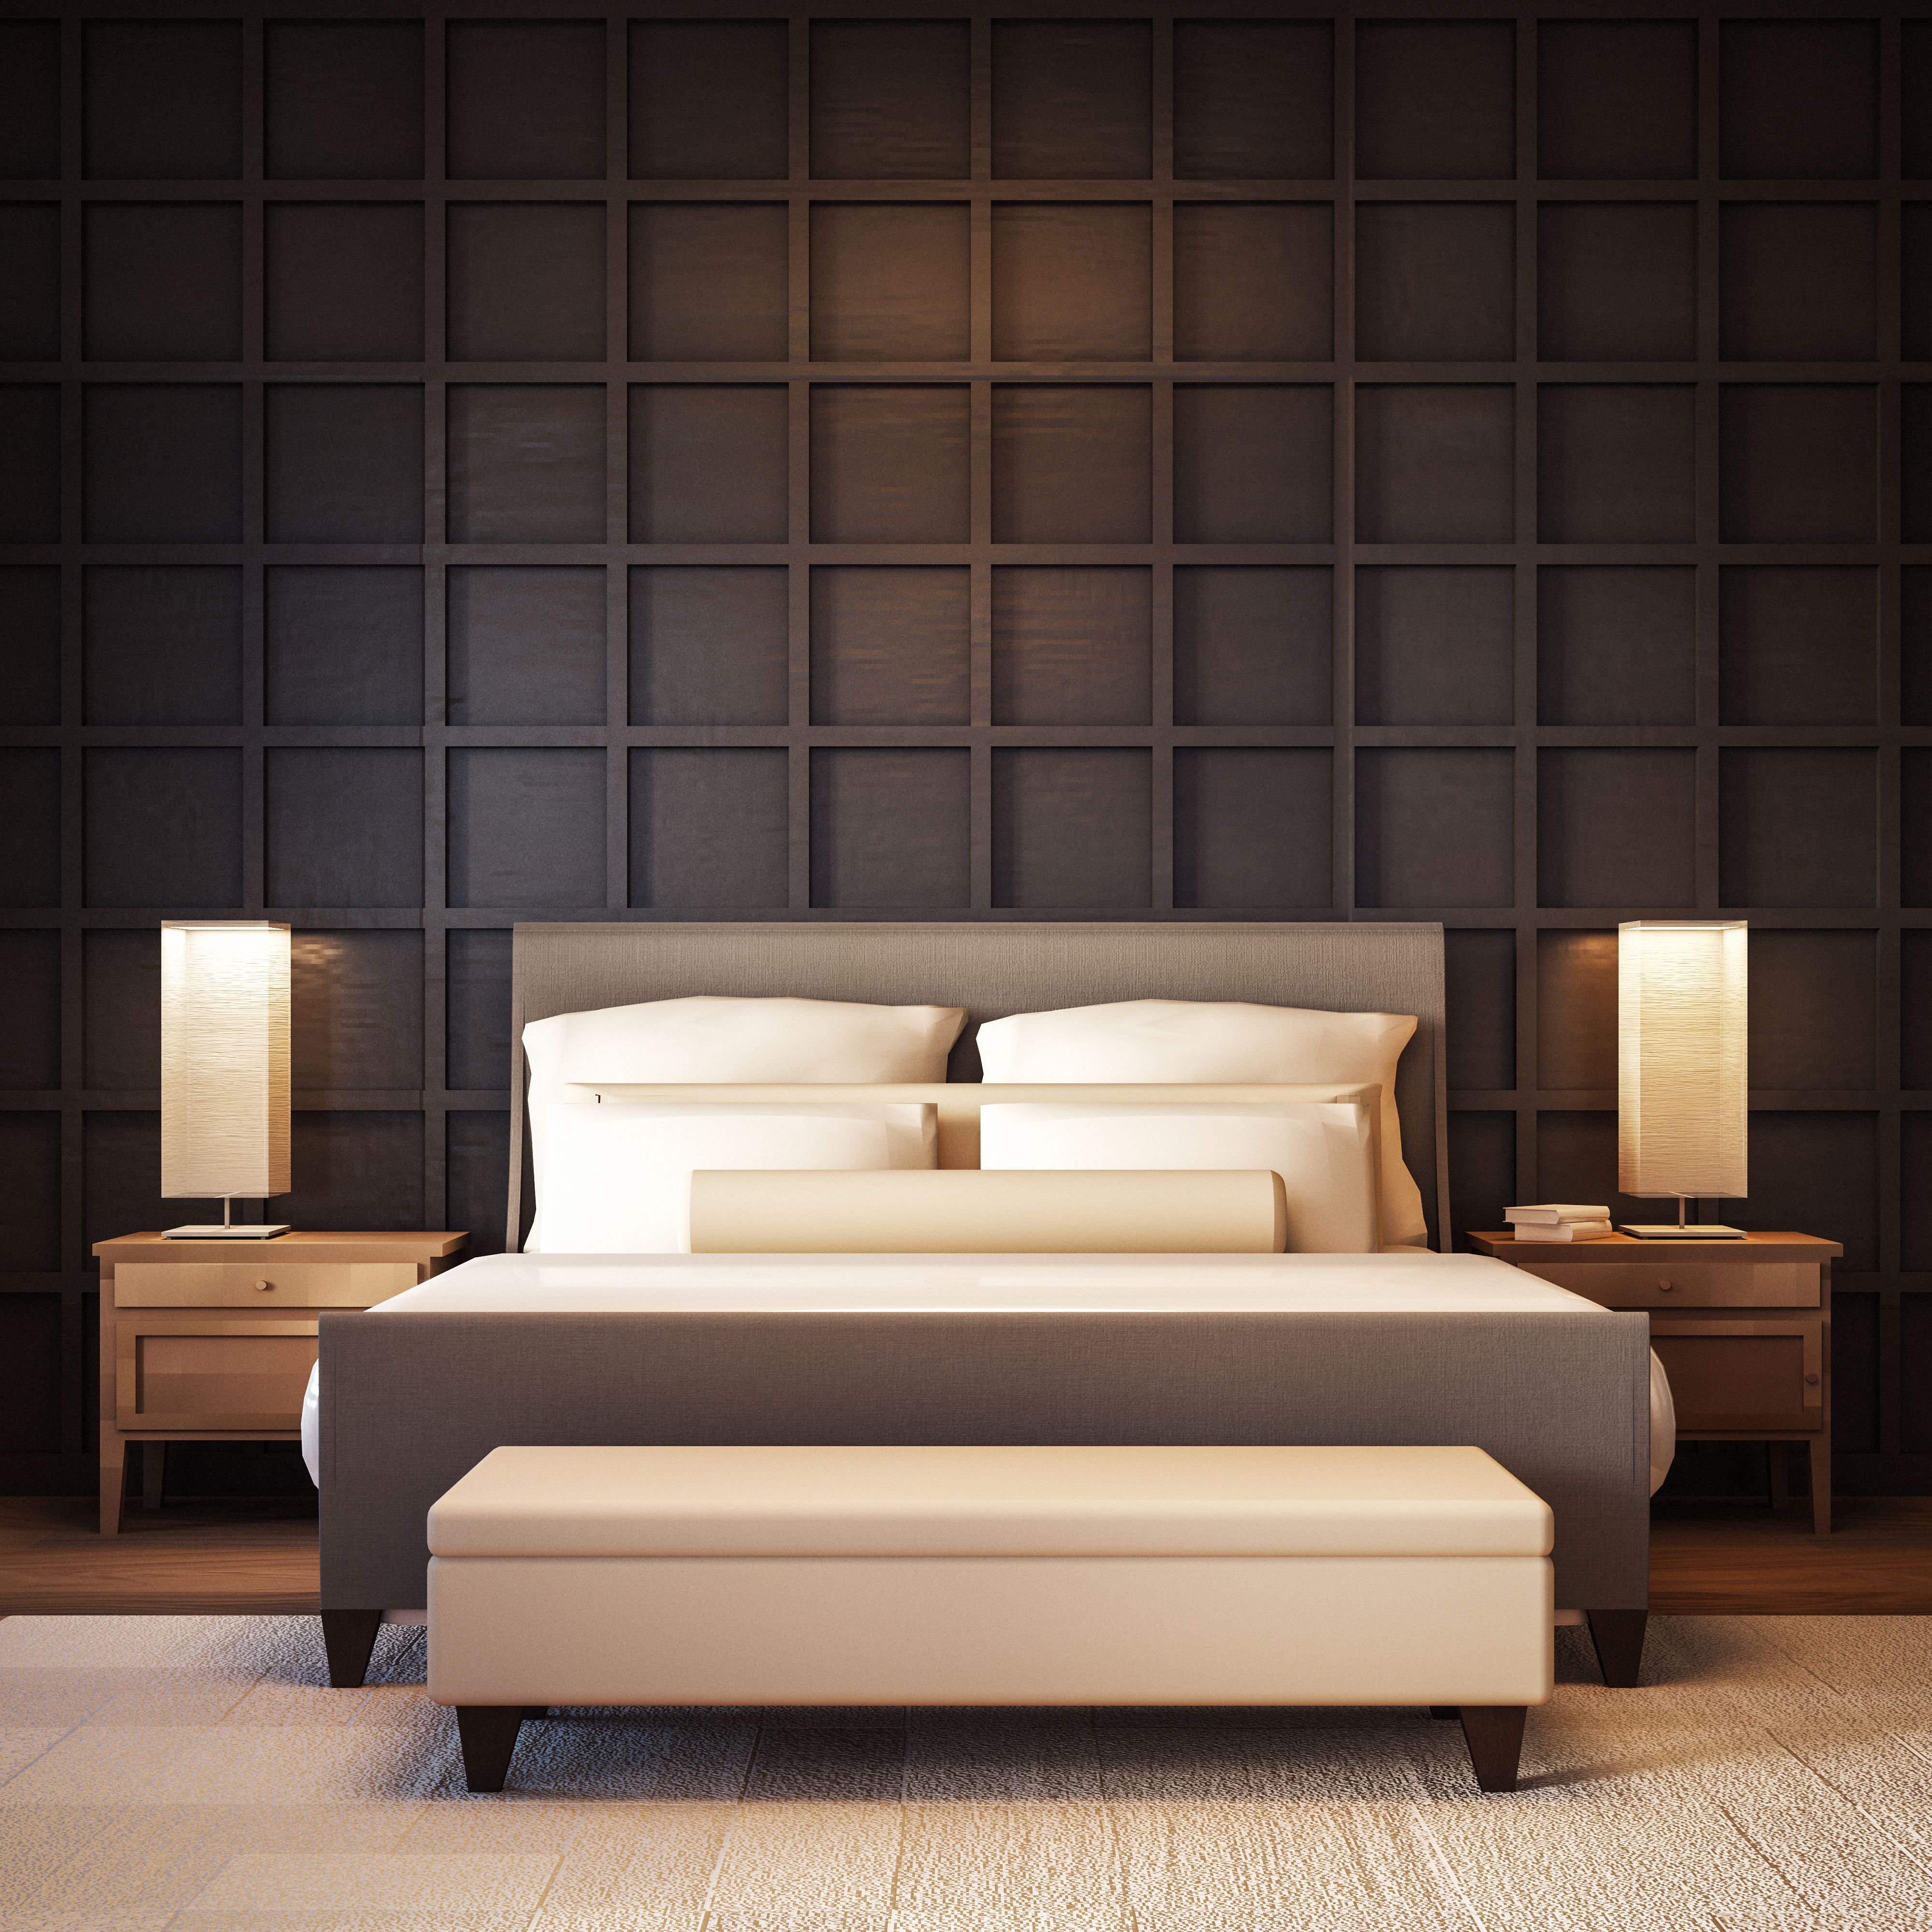 great looking master bedroom love the modern look of it but still rh pinterest com